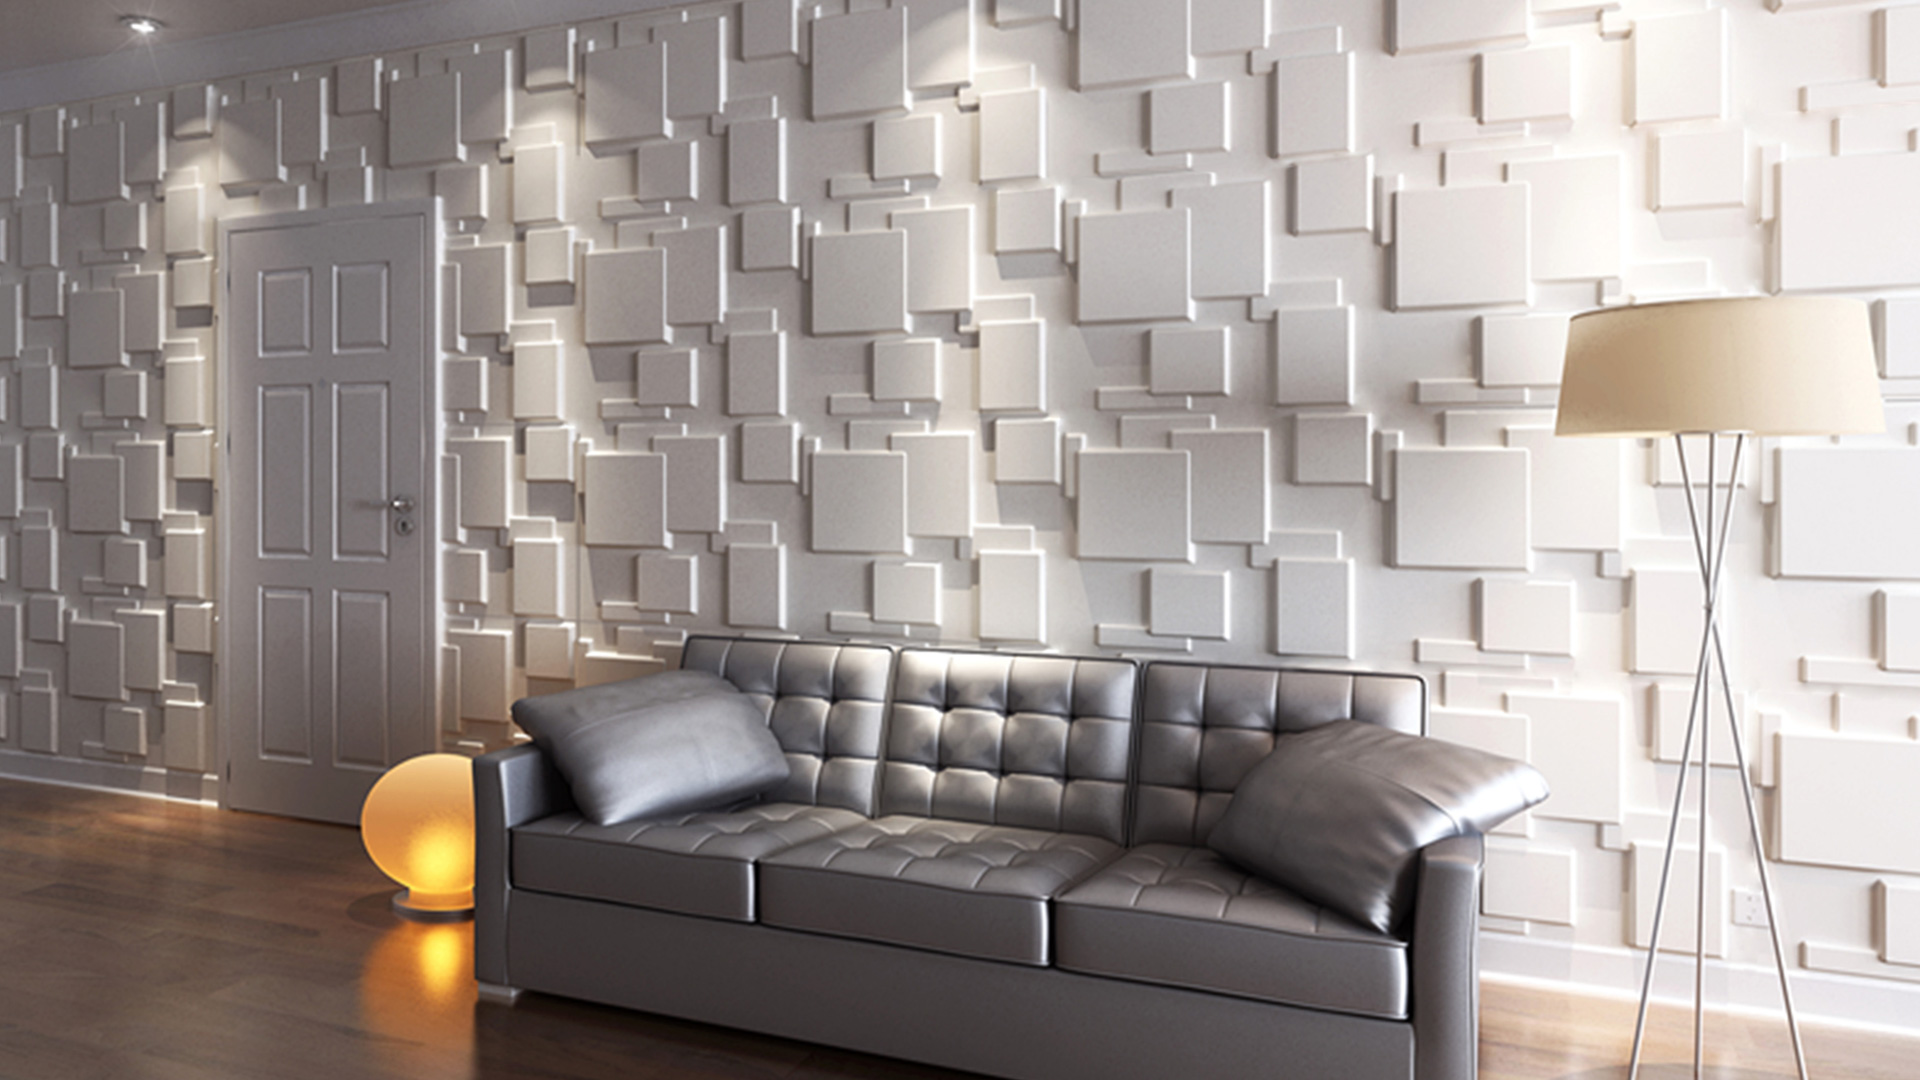 3D Wandpaneele - Produkte - Choc - Deckenpaneele - 3D Tapeten - Wandverkleidung